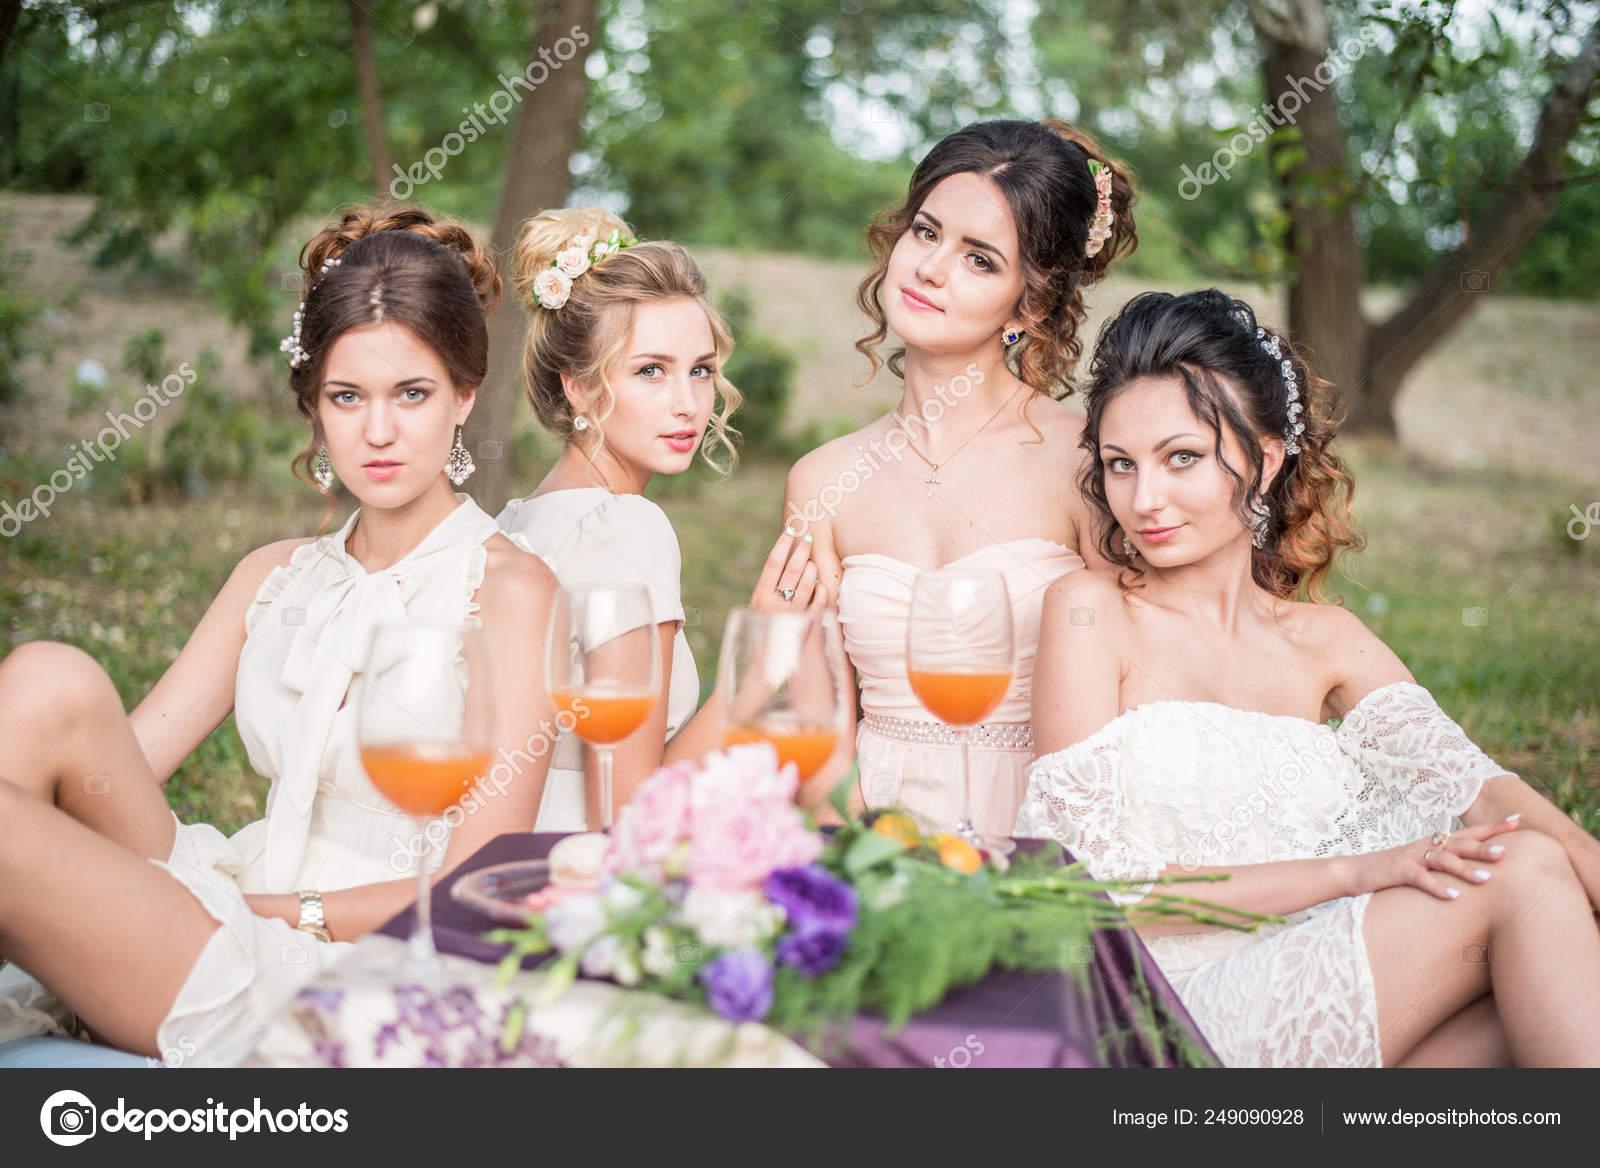 ukranian women dating